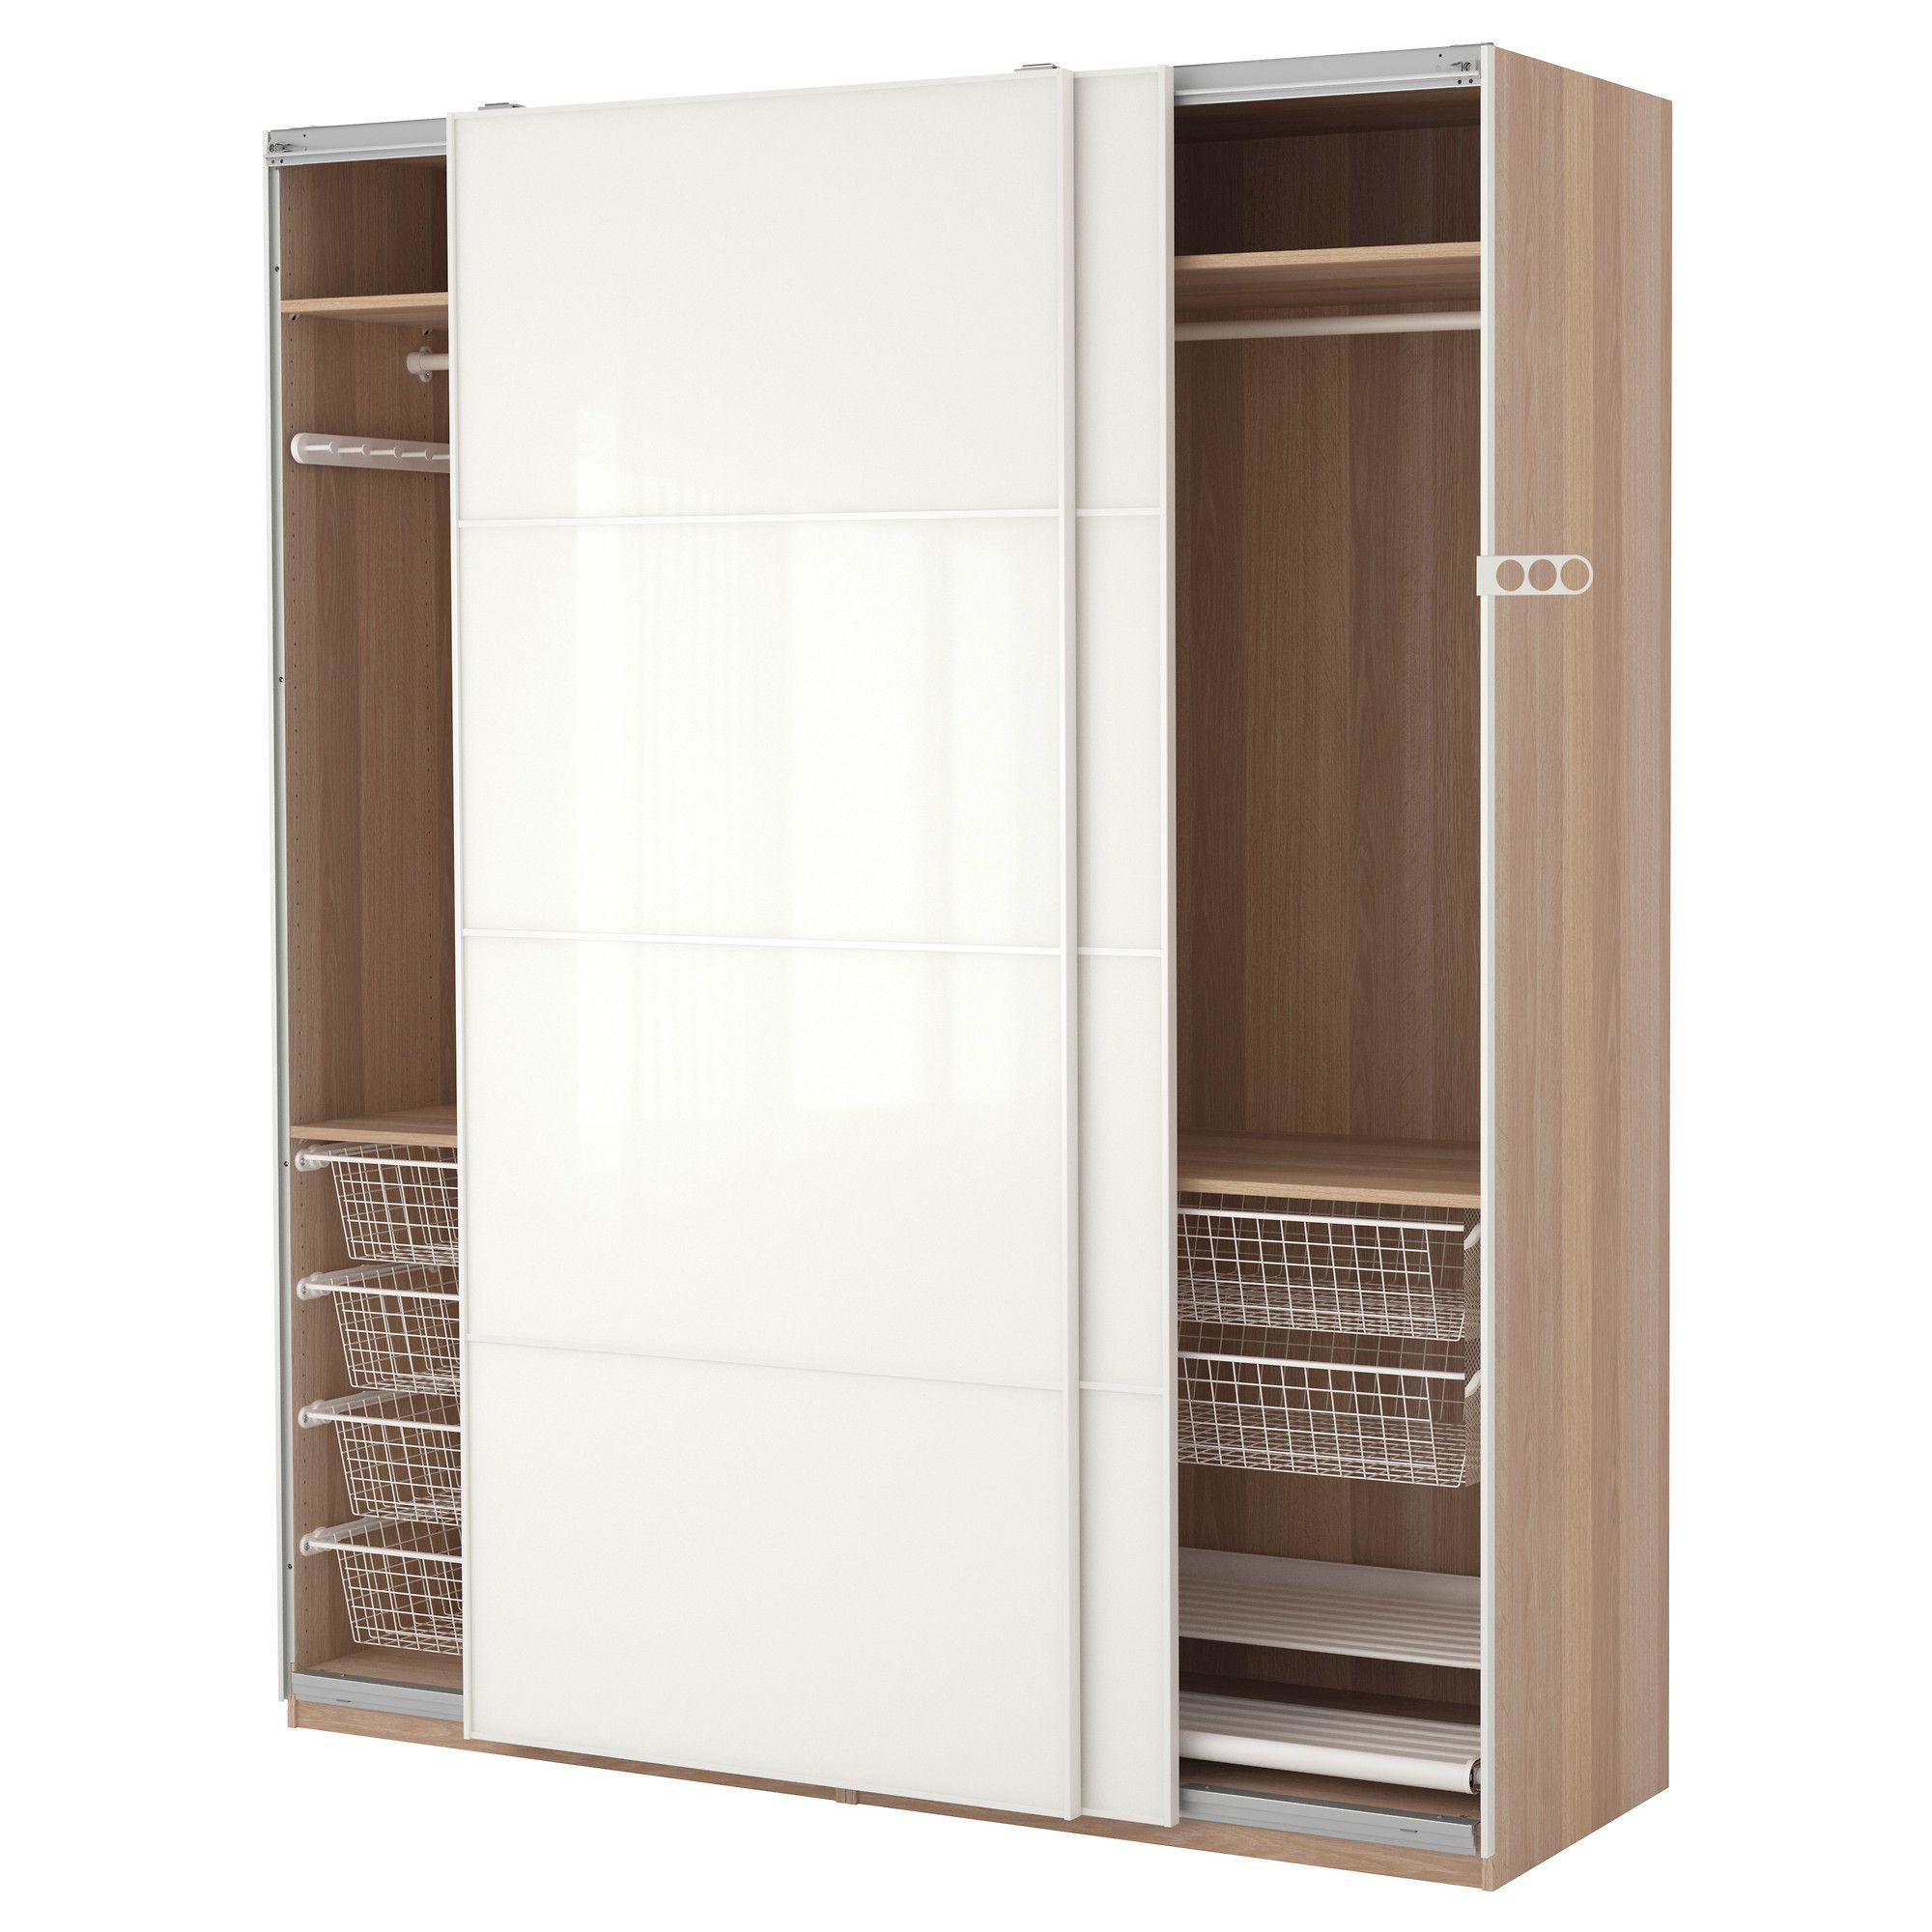 US Furniture and Home Furnishings Ikea wardrobe, Ikea